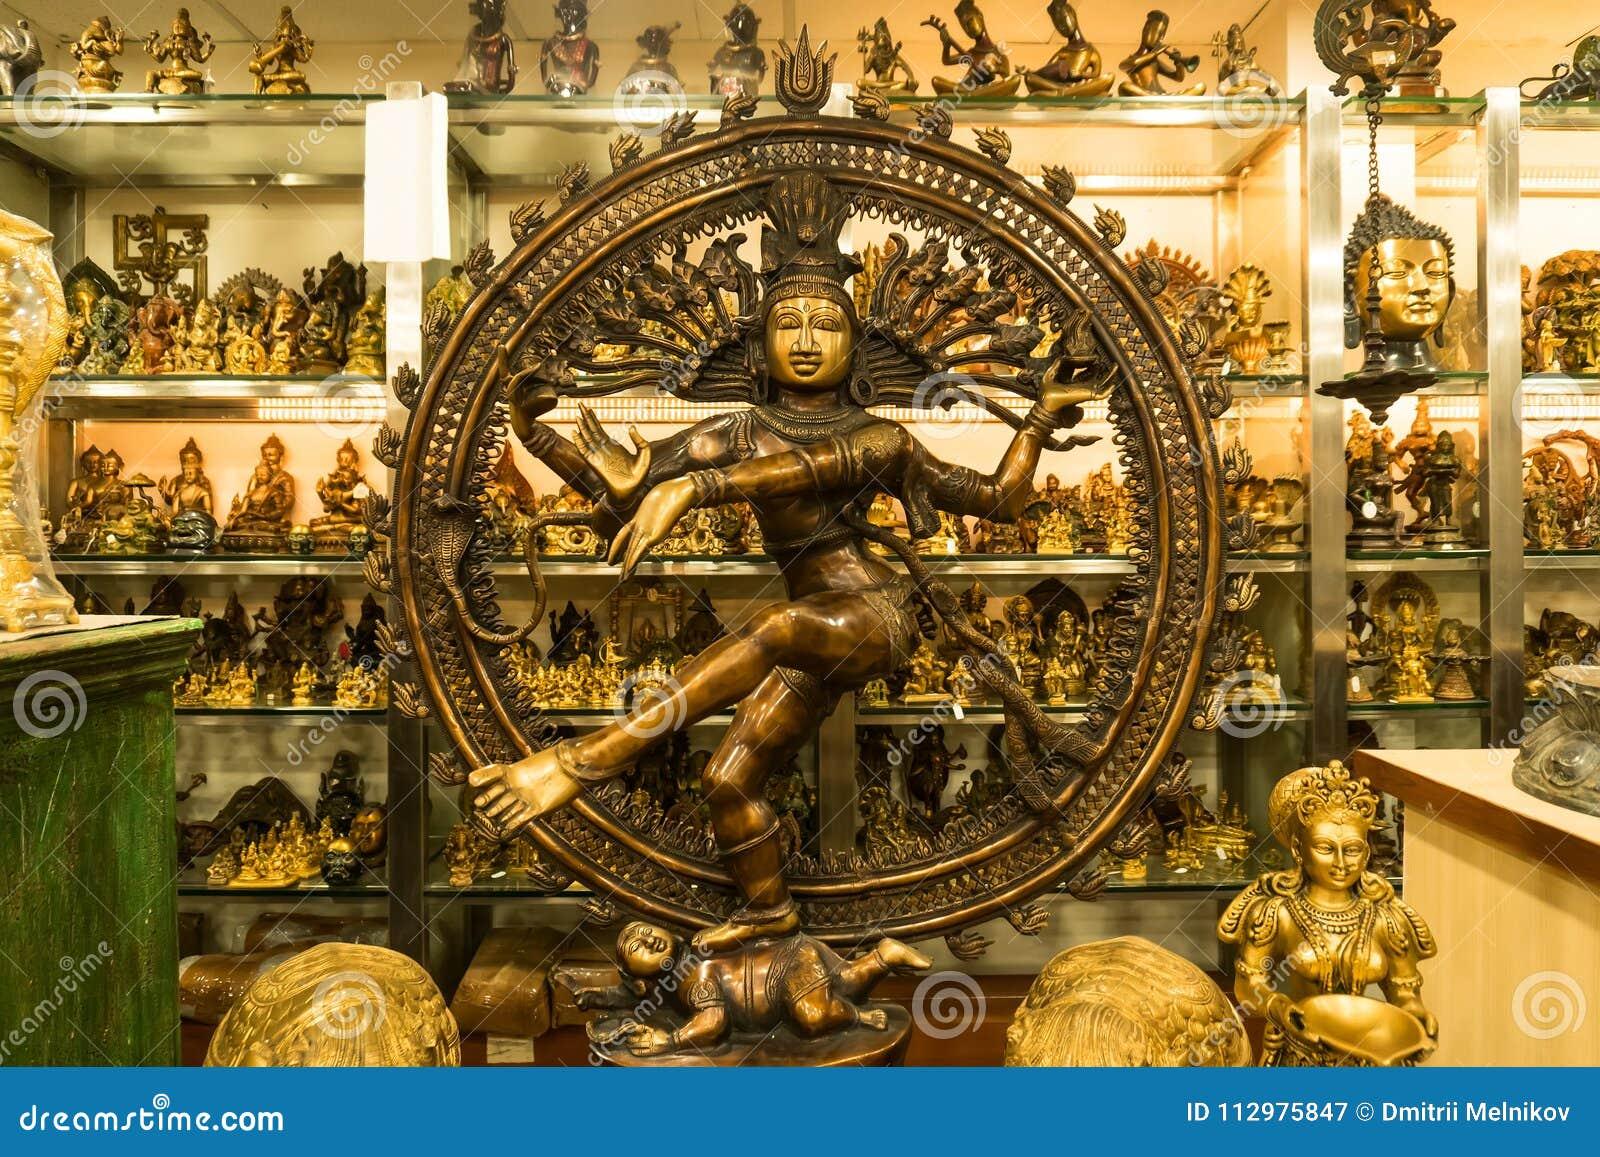 Bronze statue of indian goddess Shiva Nataraja - Lord of Dance